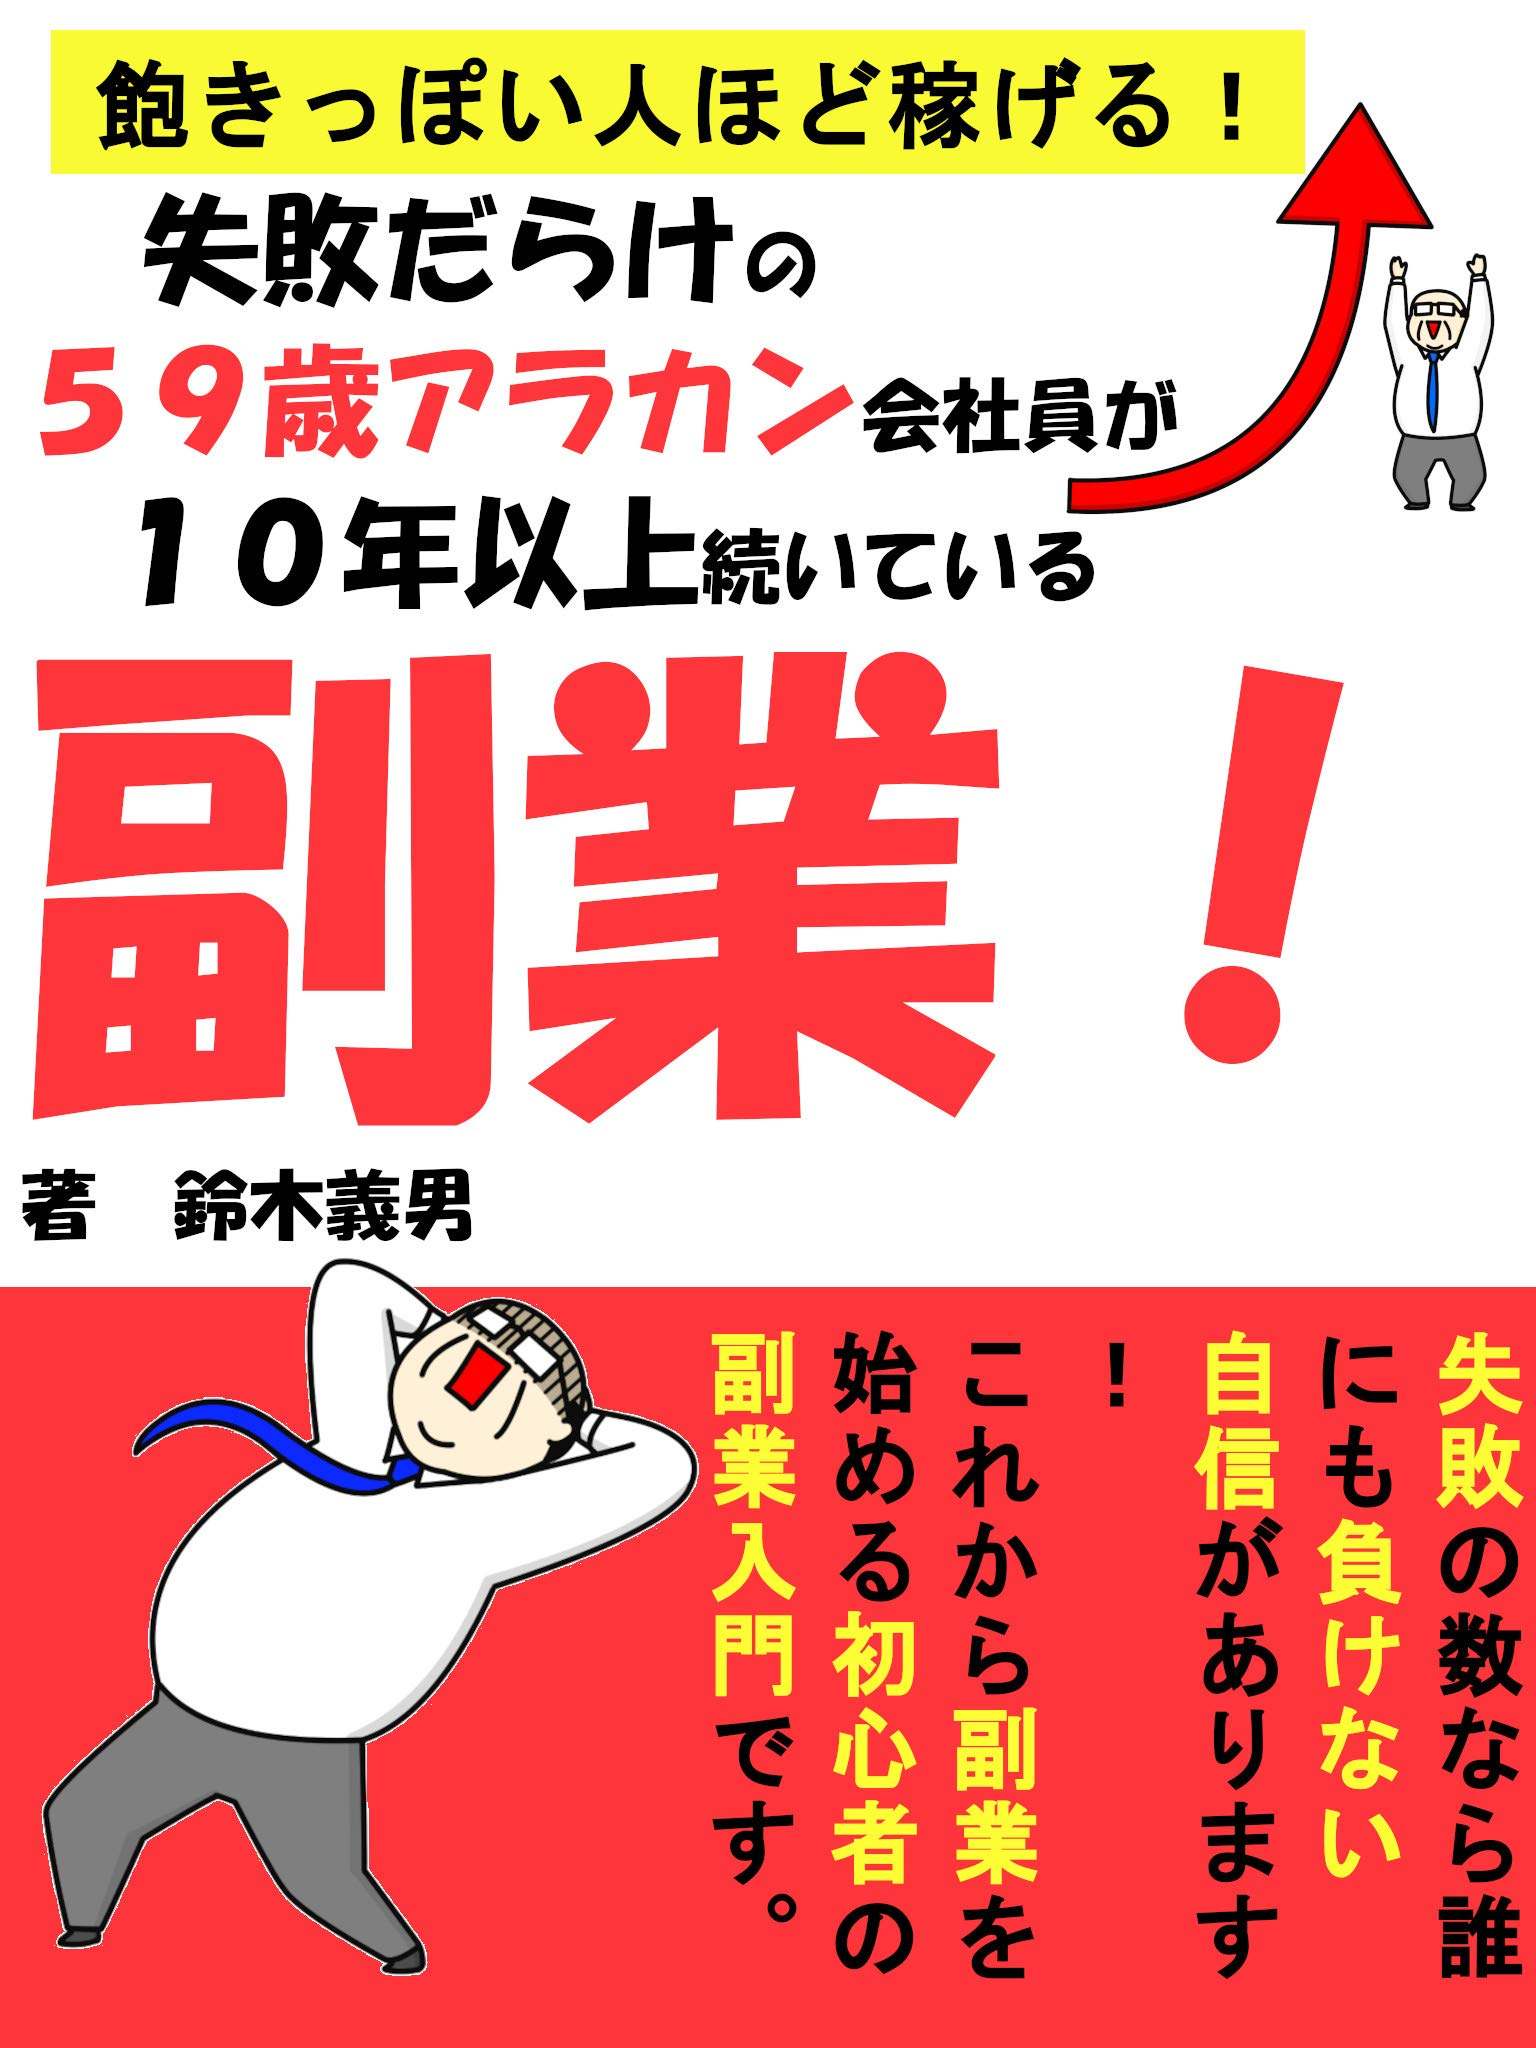 akipoihitohodoksegeru: shipaidarakenogojyukyusaiarakankaisyaingajyunenijyotuzuketeirufukugyo (Japanese Edition)